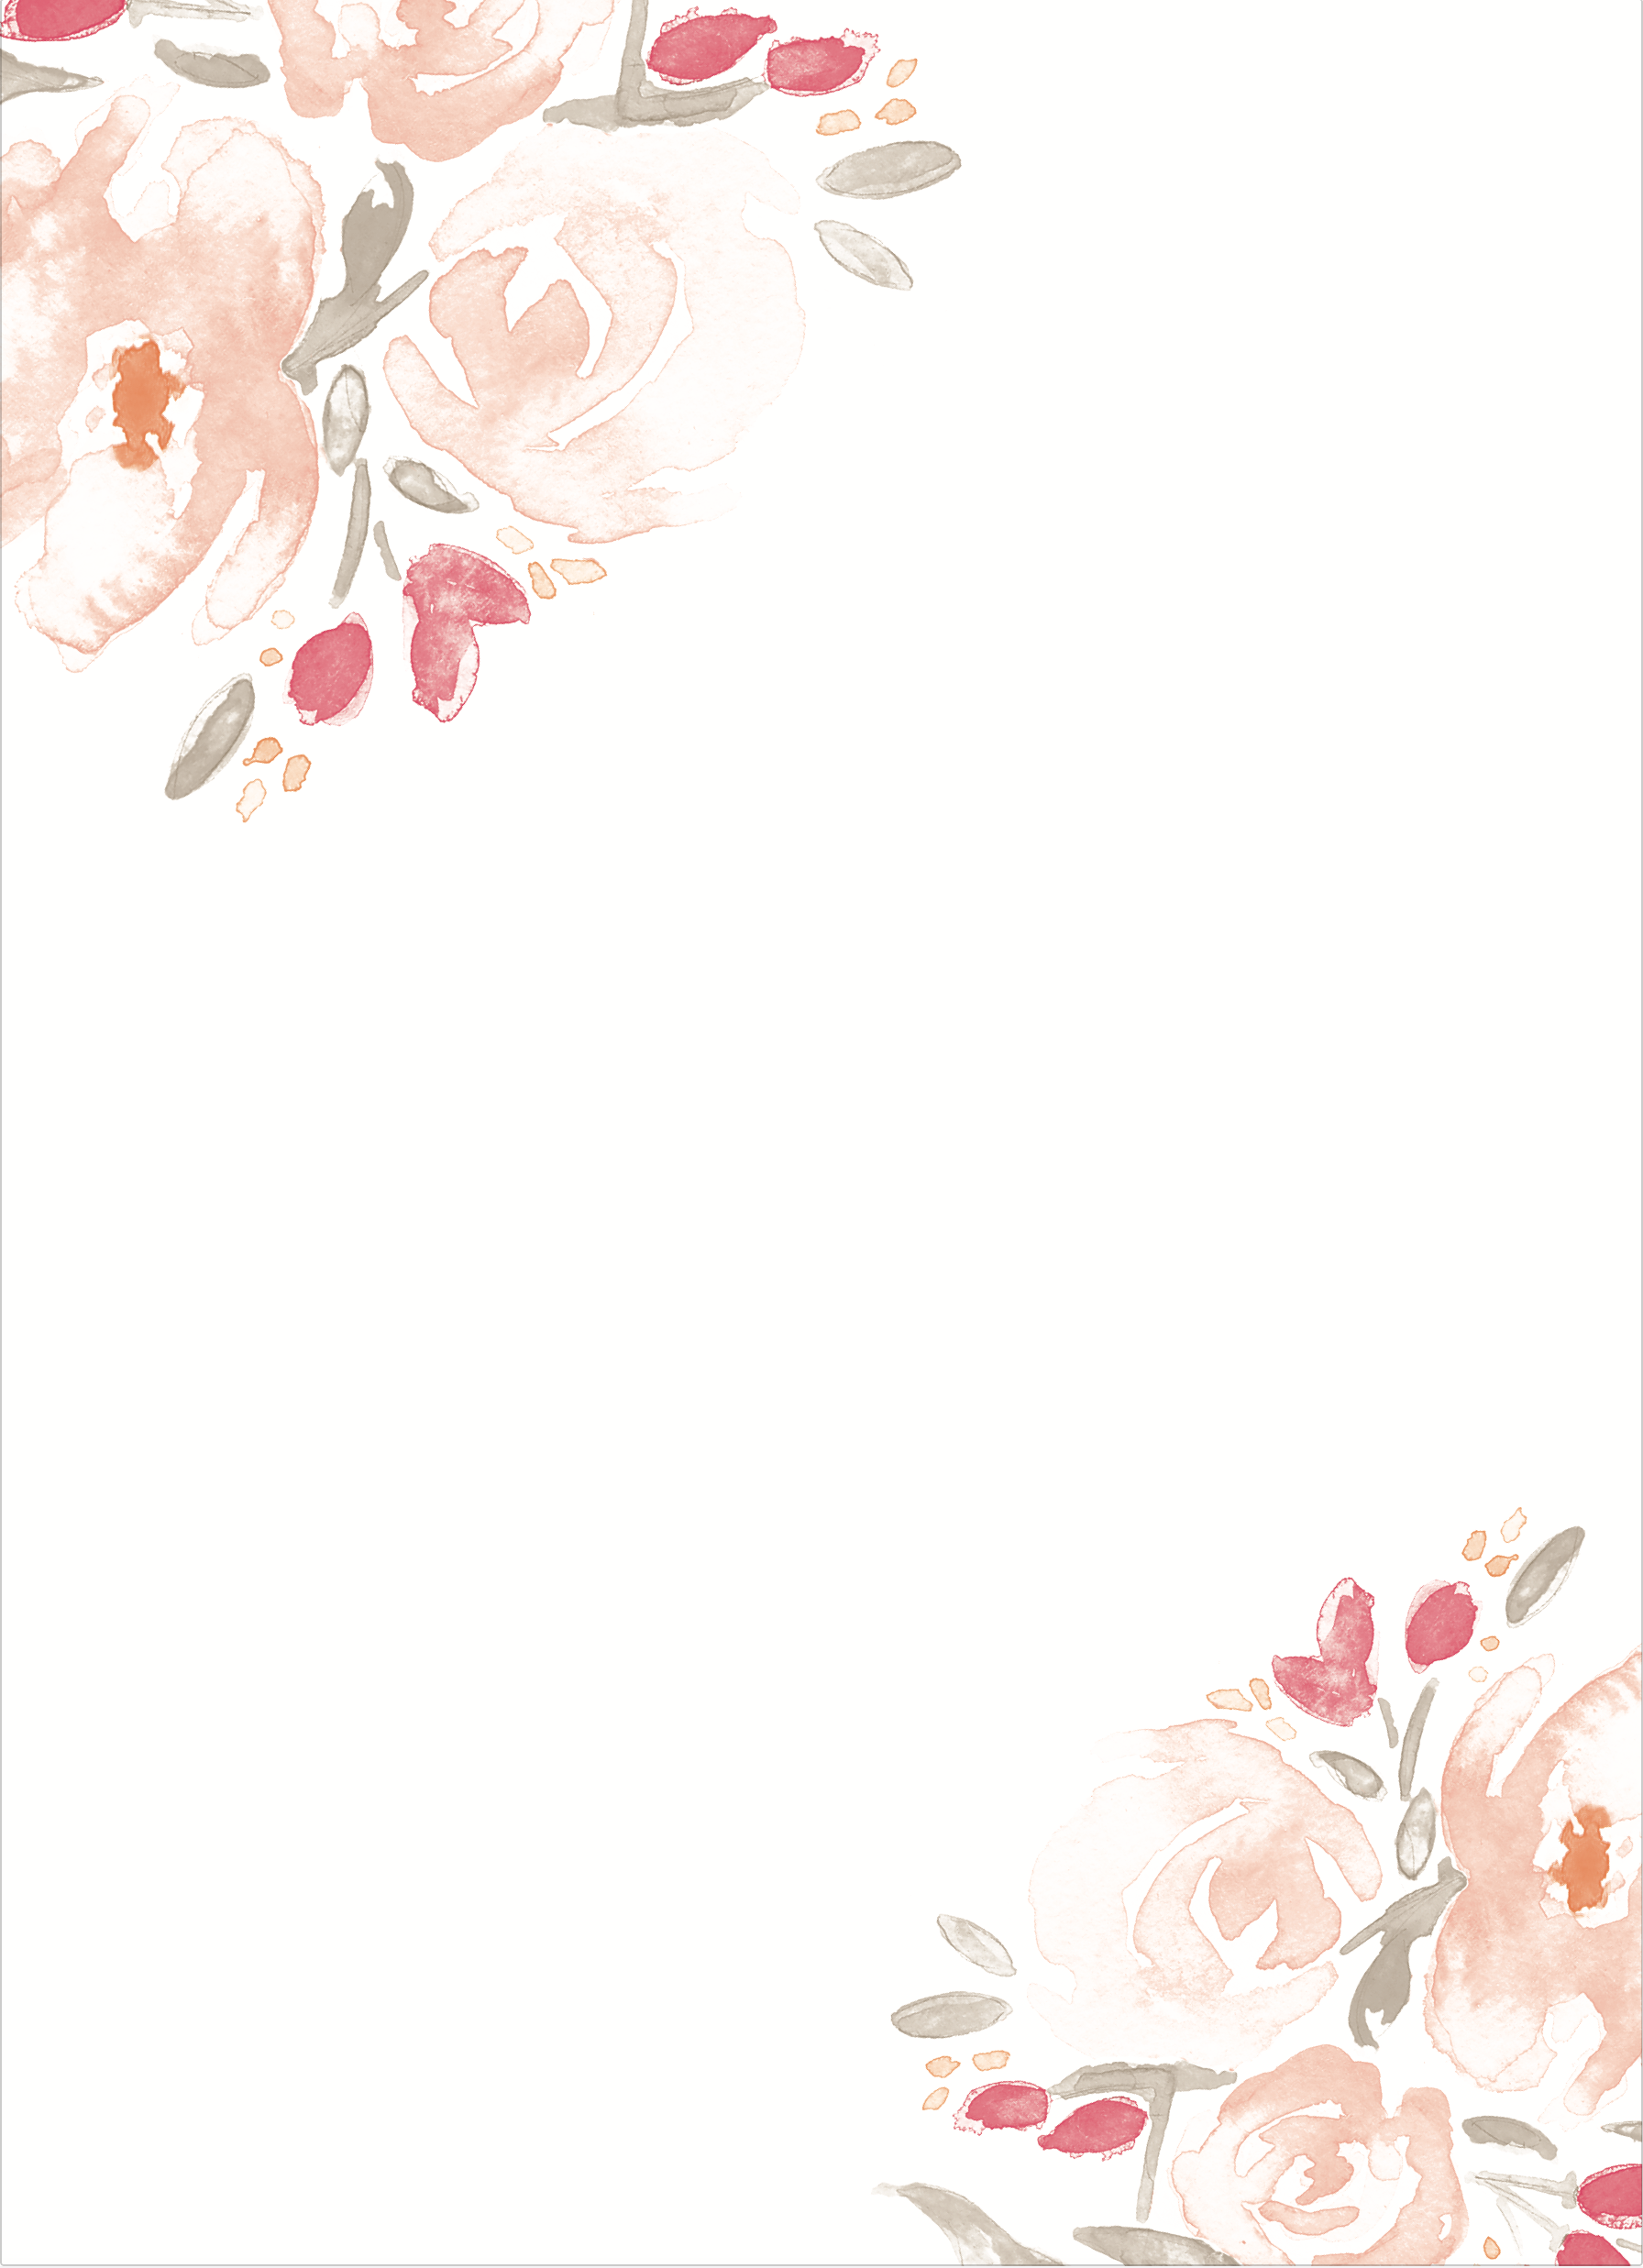 Wedding Invitation Background Design Png Valoblogi Com